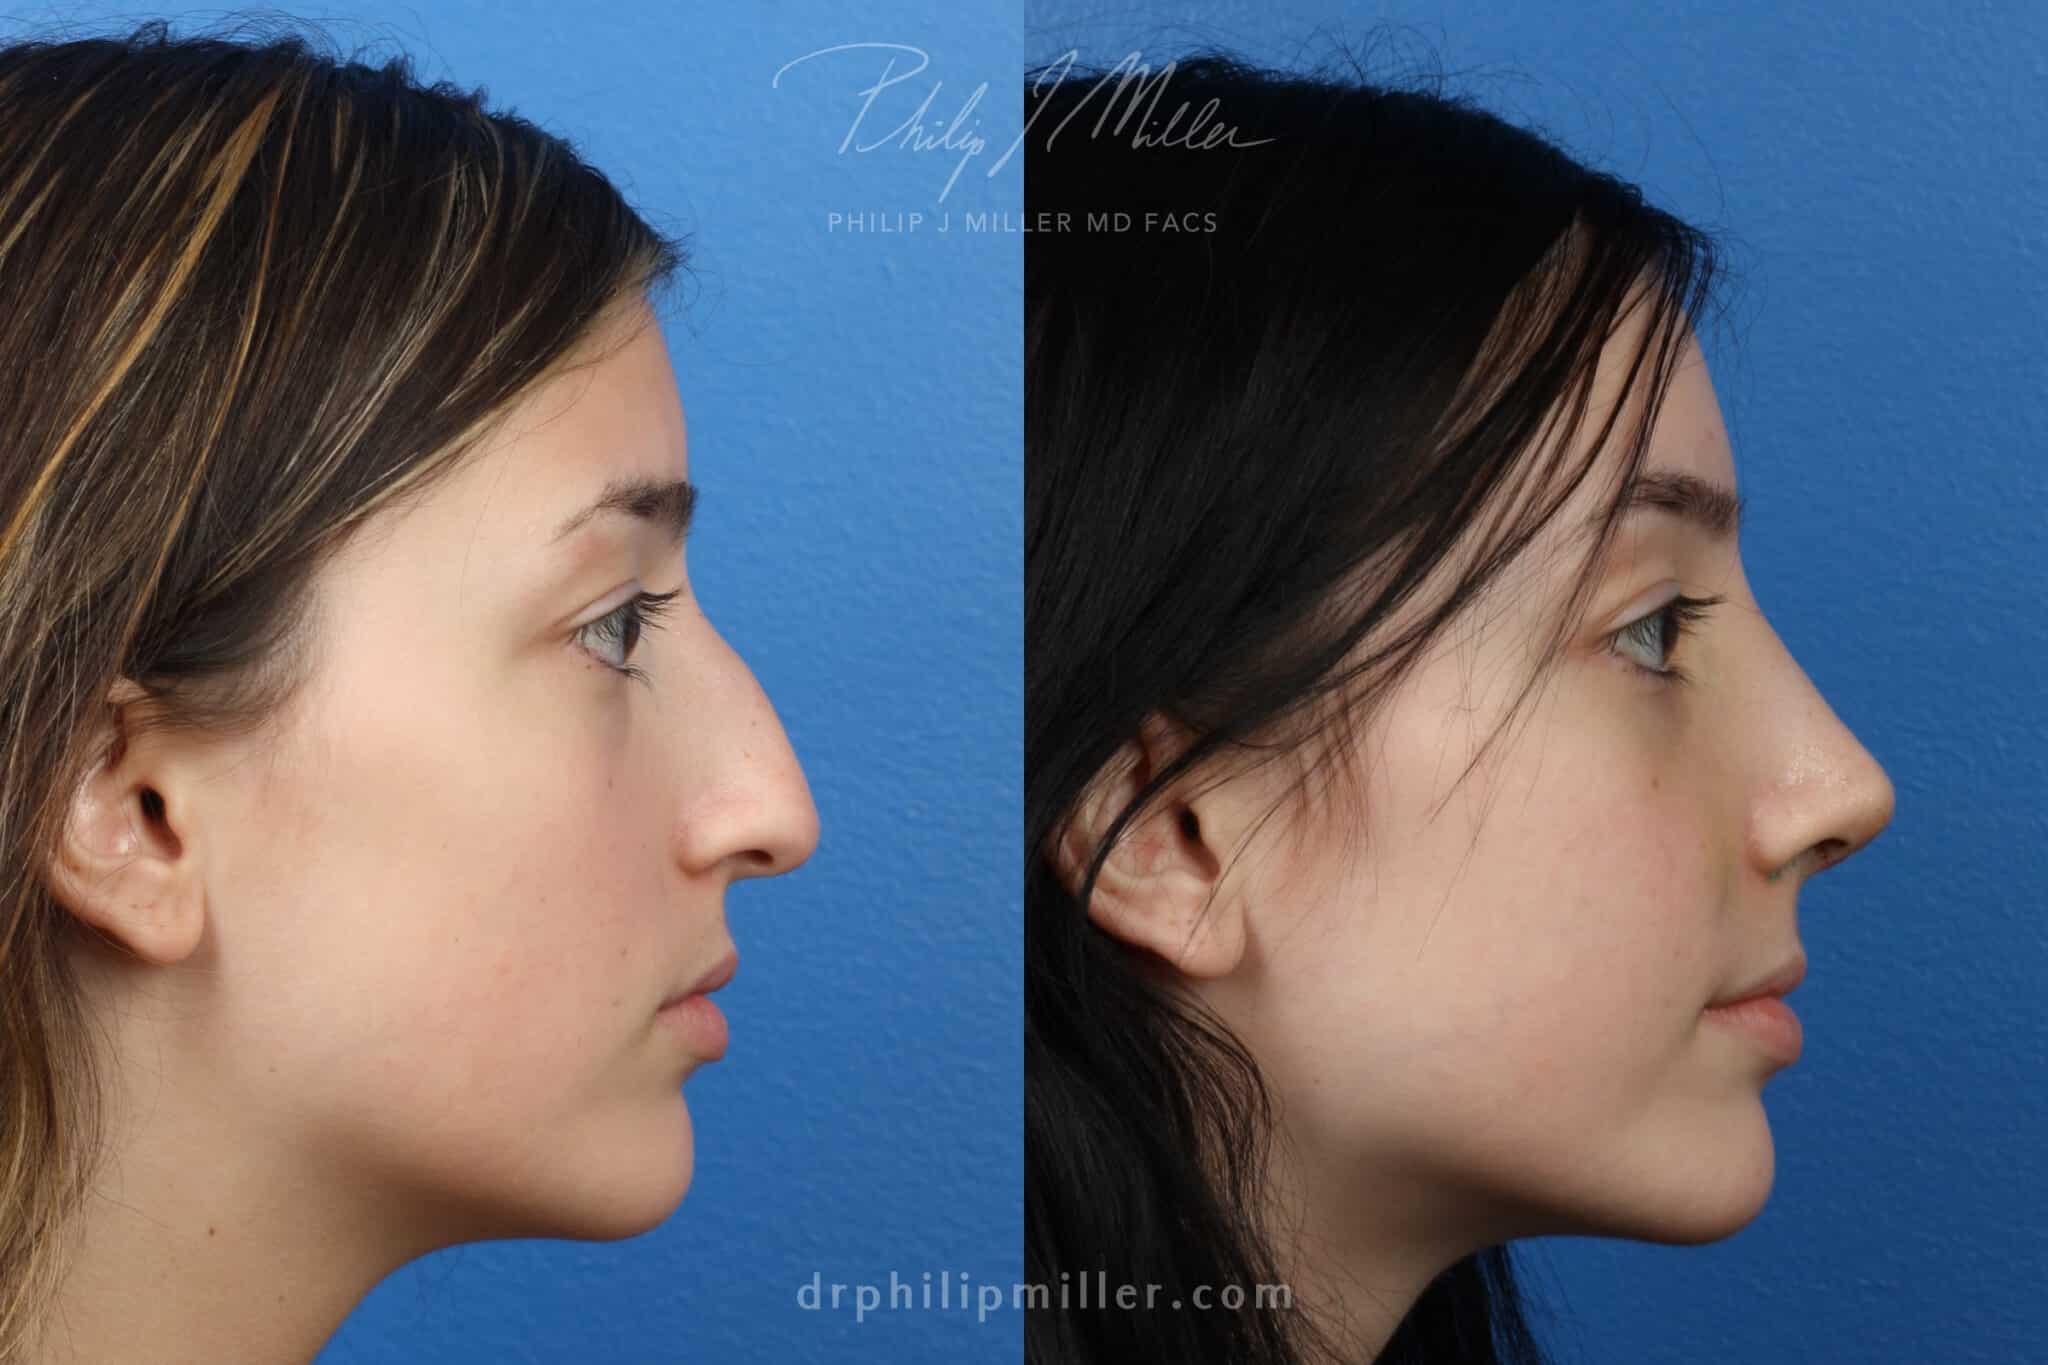 Rhinoplasty to straighten nasal bridge and rotate tip, one week post-op by Dr. Miller